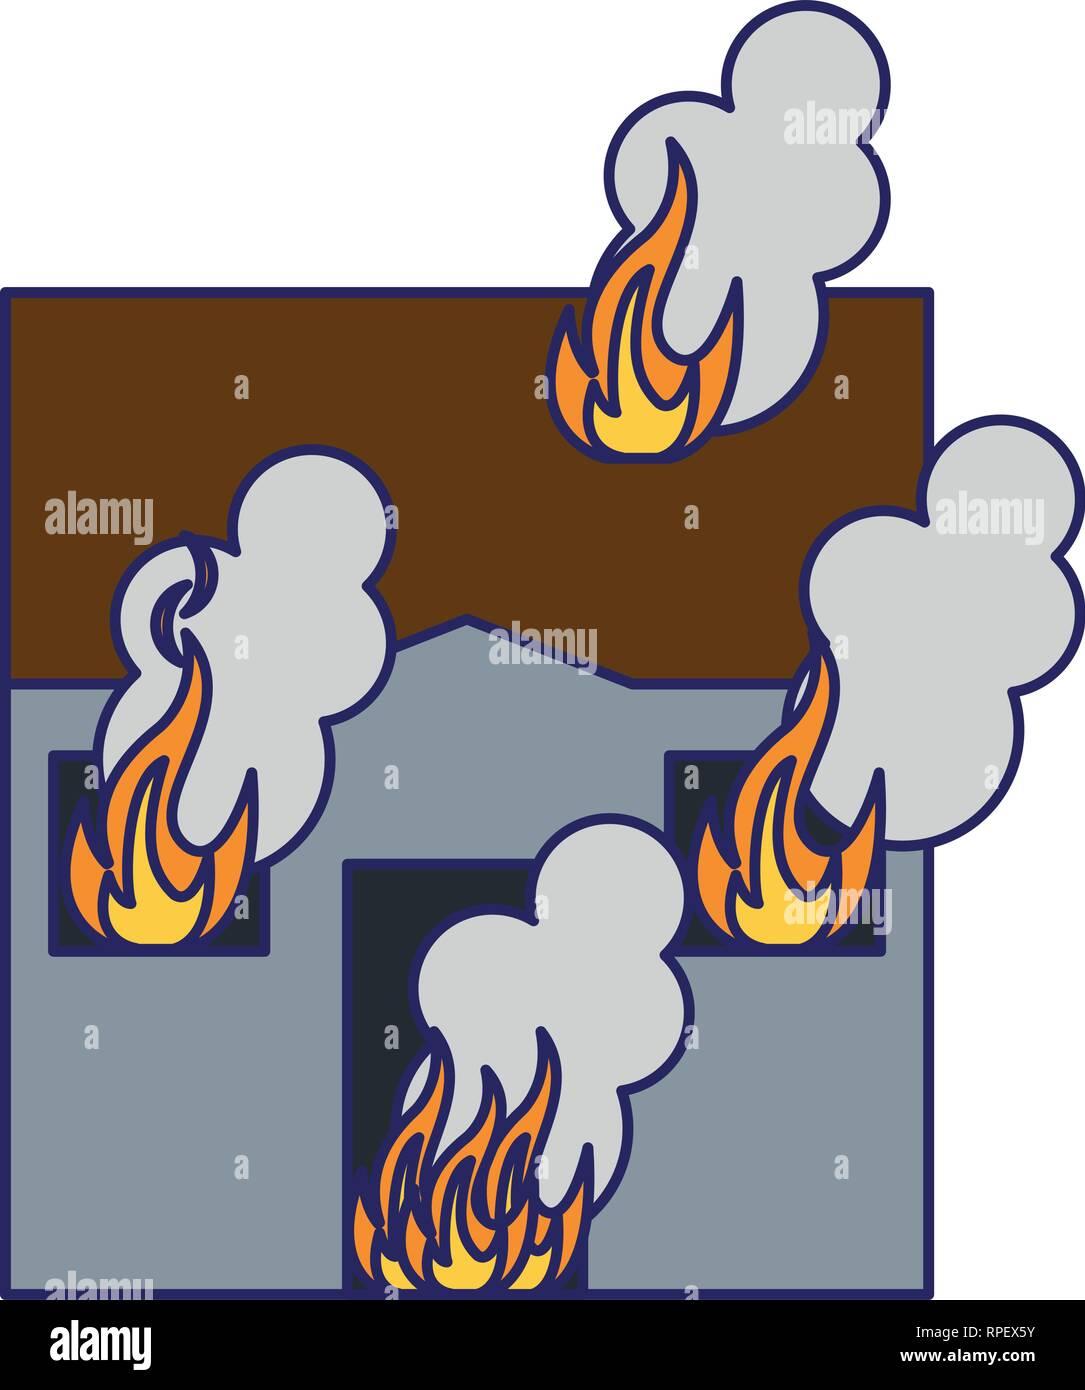 House In Fire Cartoon Blue Lines Stock Vector Art Illustration